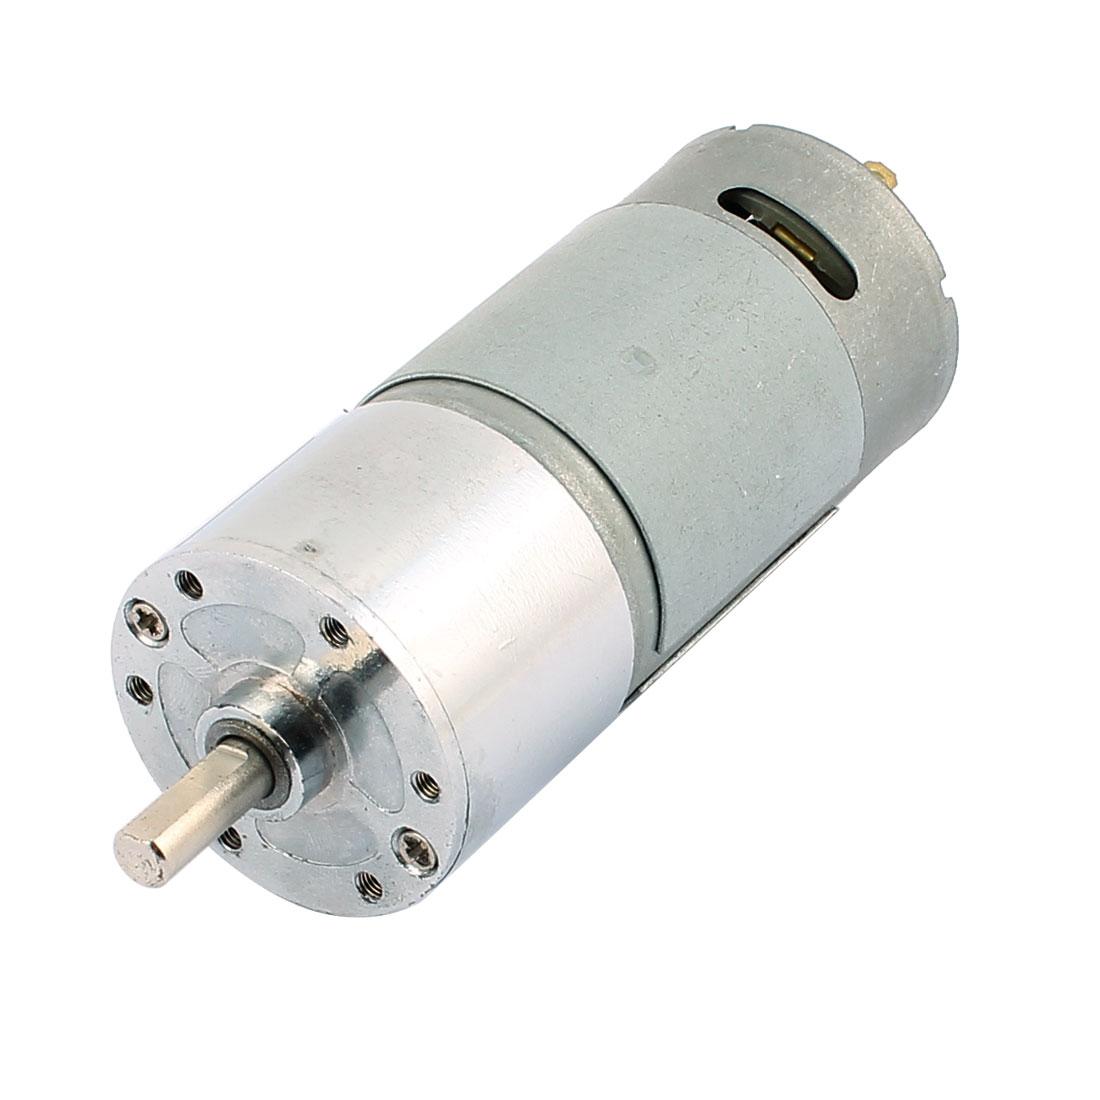 5mm Dia Shaft High Torque Solder Cylindrical Gear Box DC Motor DC 12V 200RPM